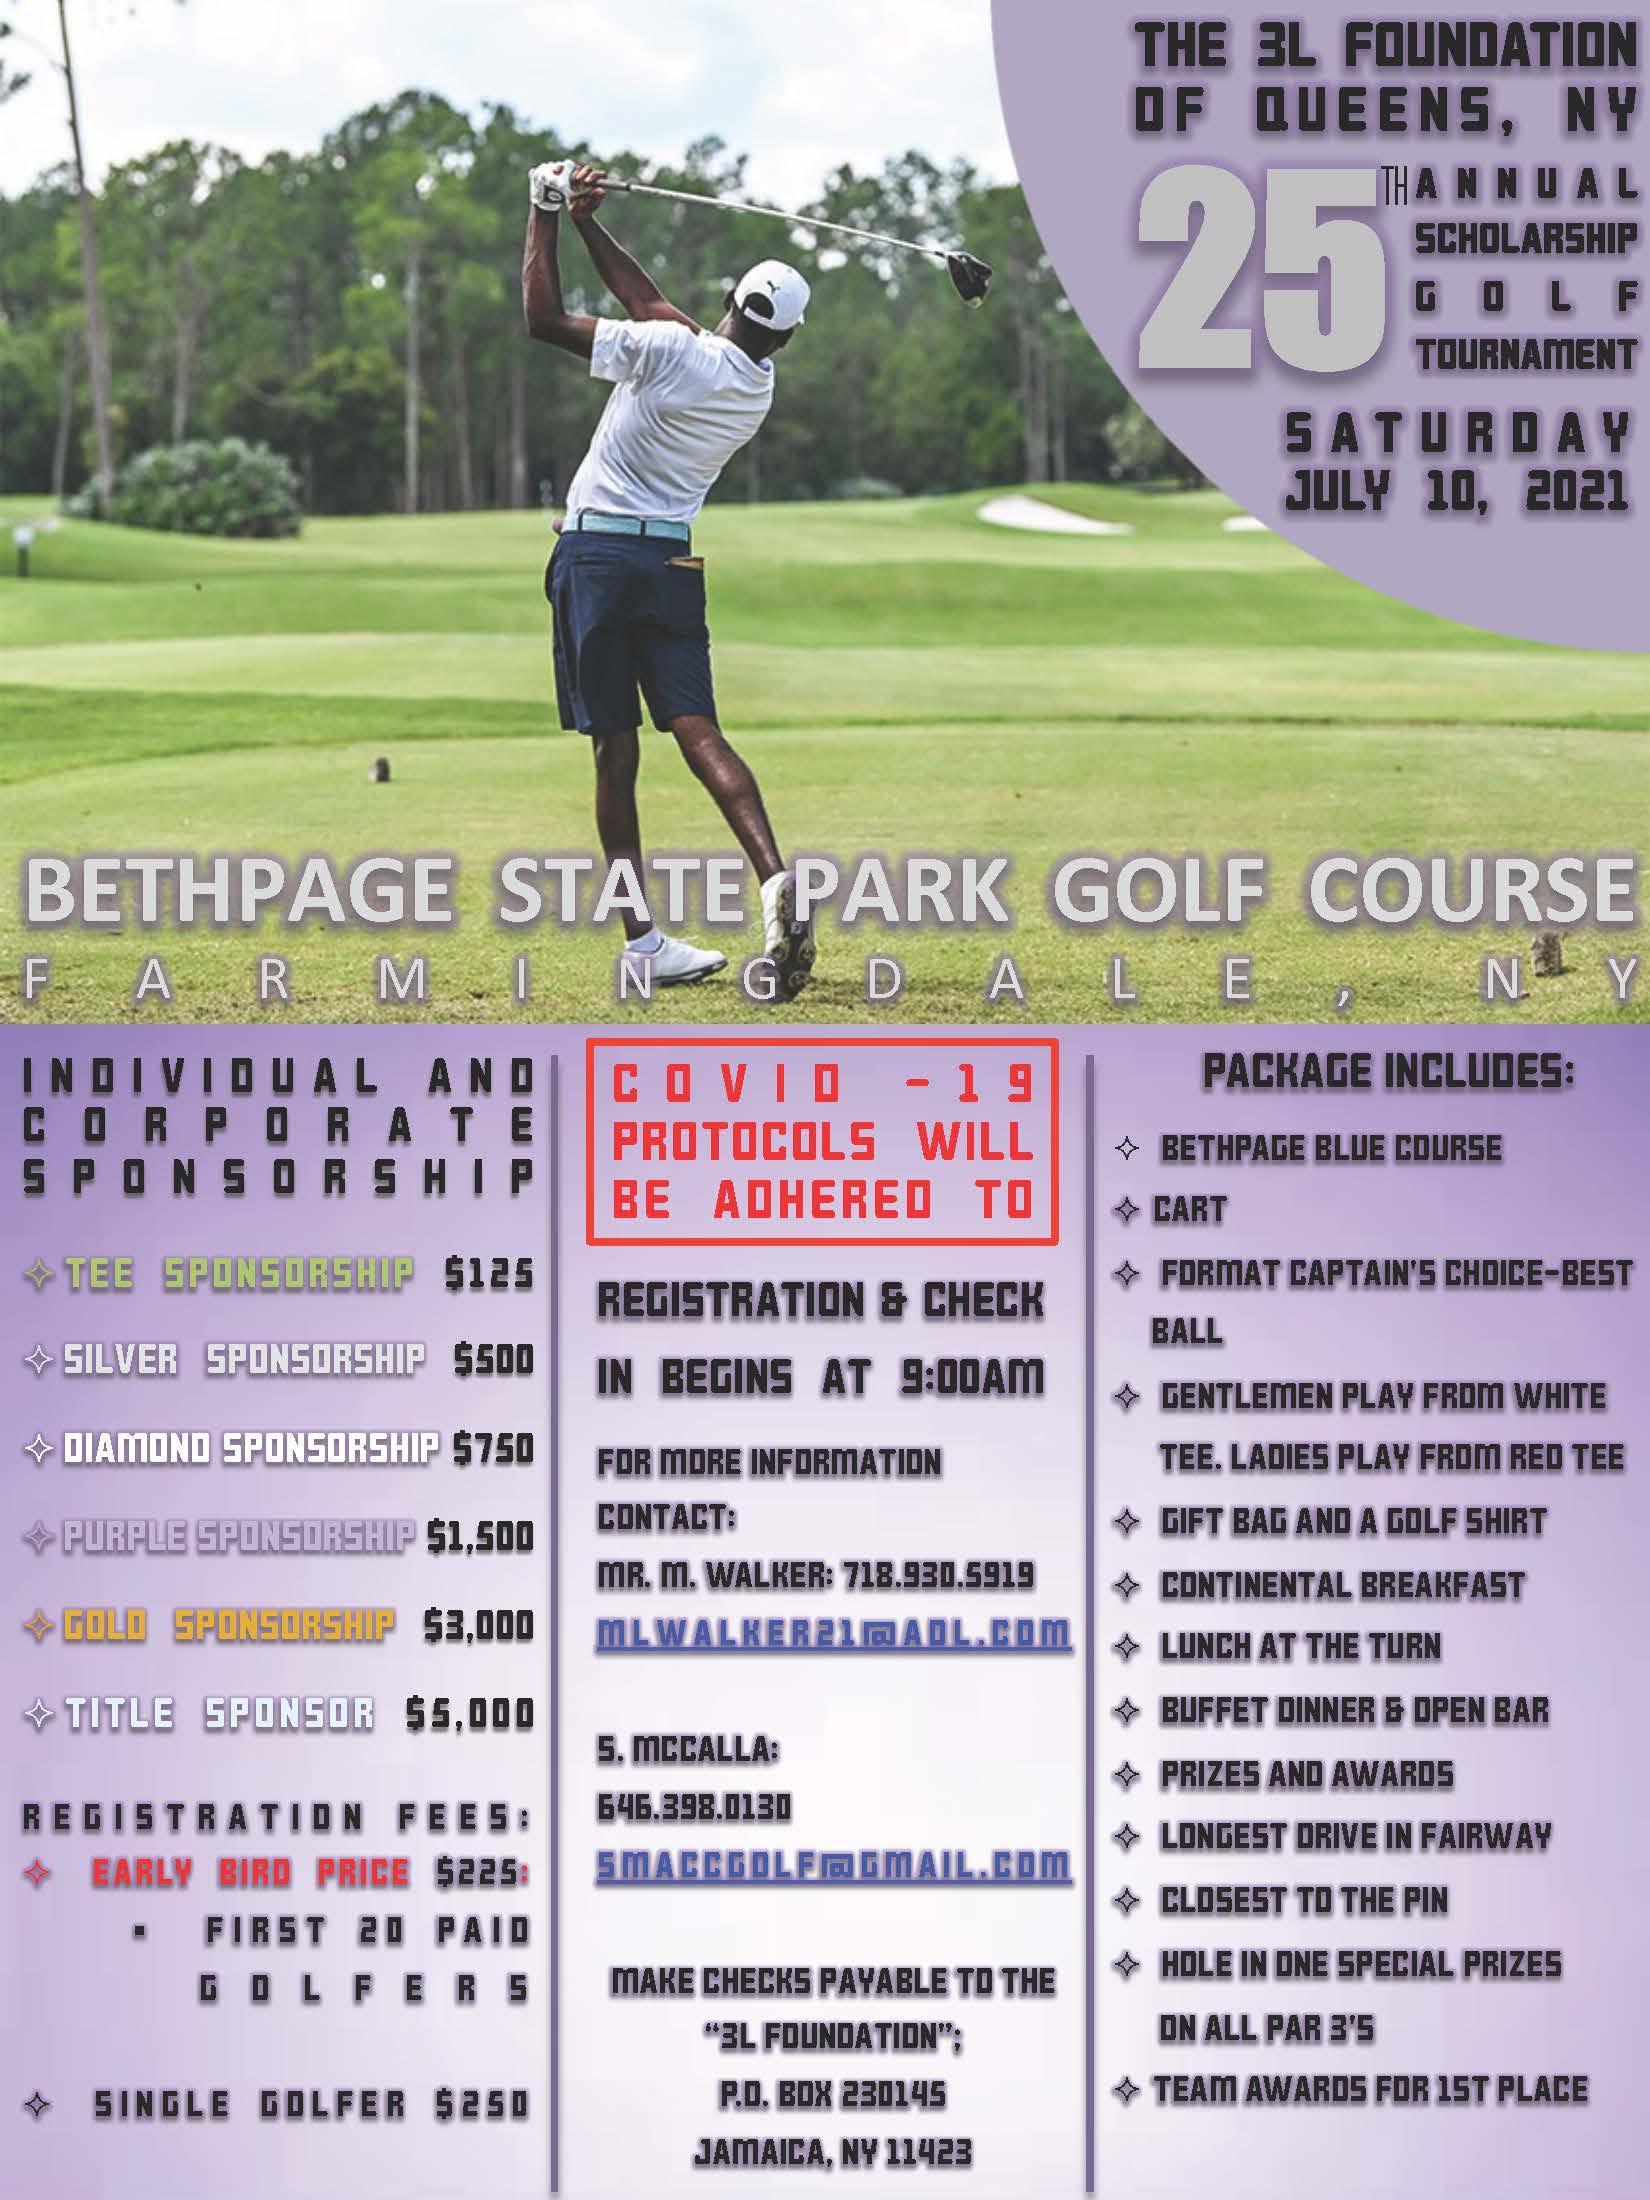 25th Annual Scholarship Golf Classic